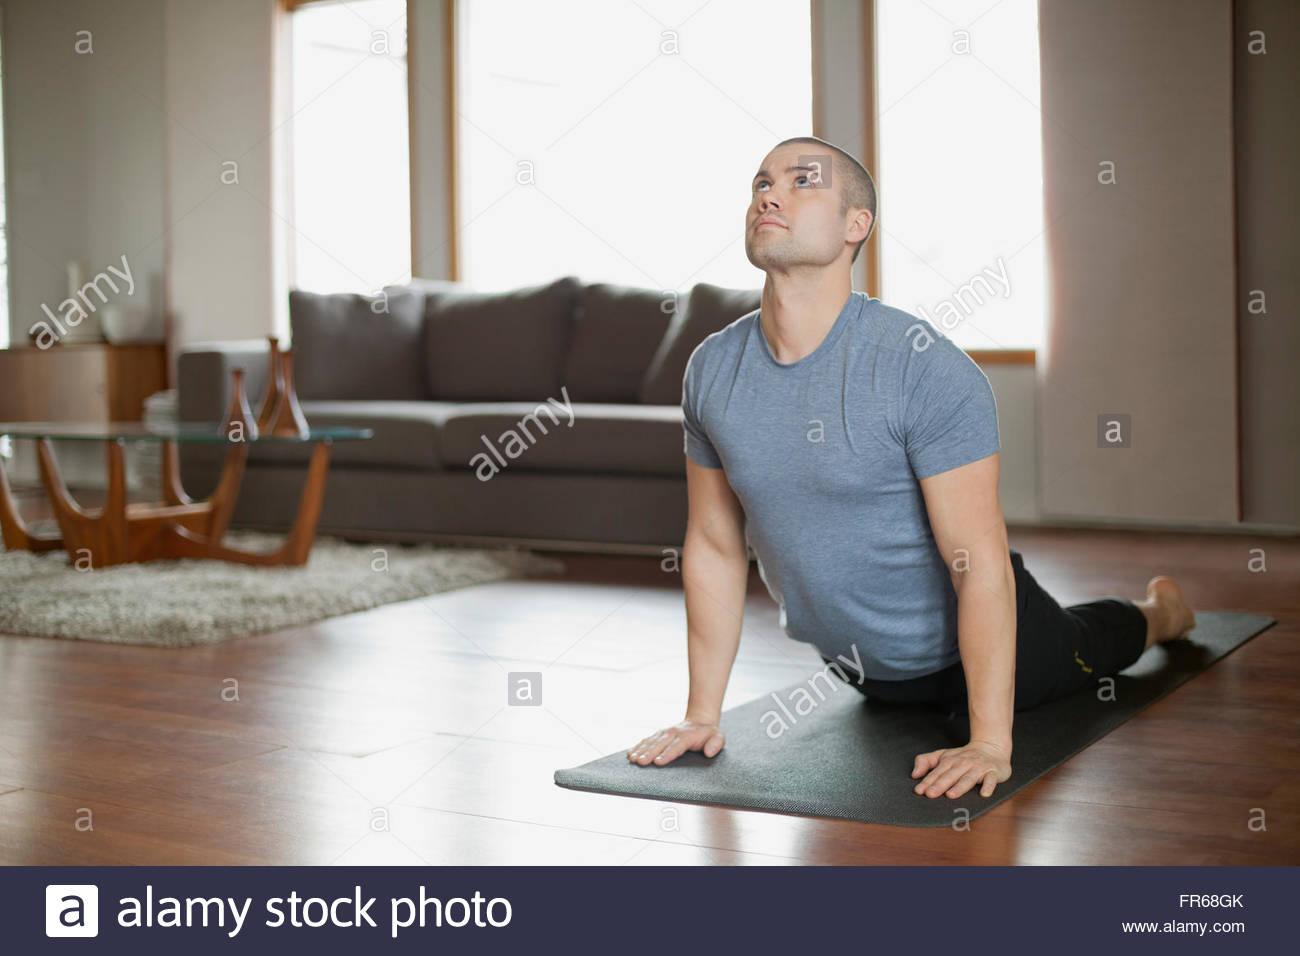 Man Doing Yoga Poses At Home